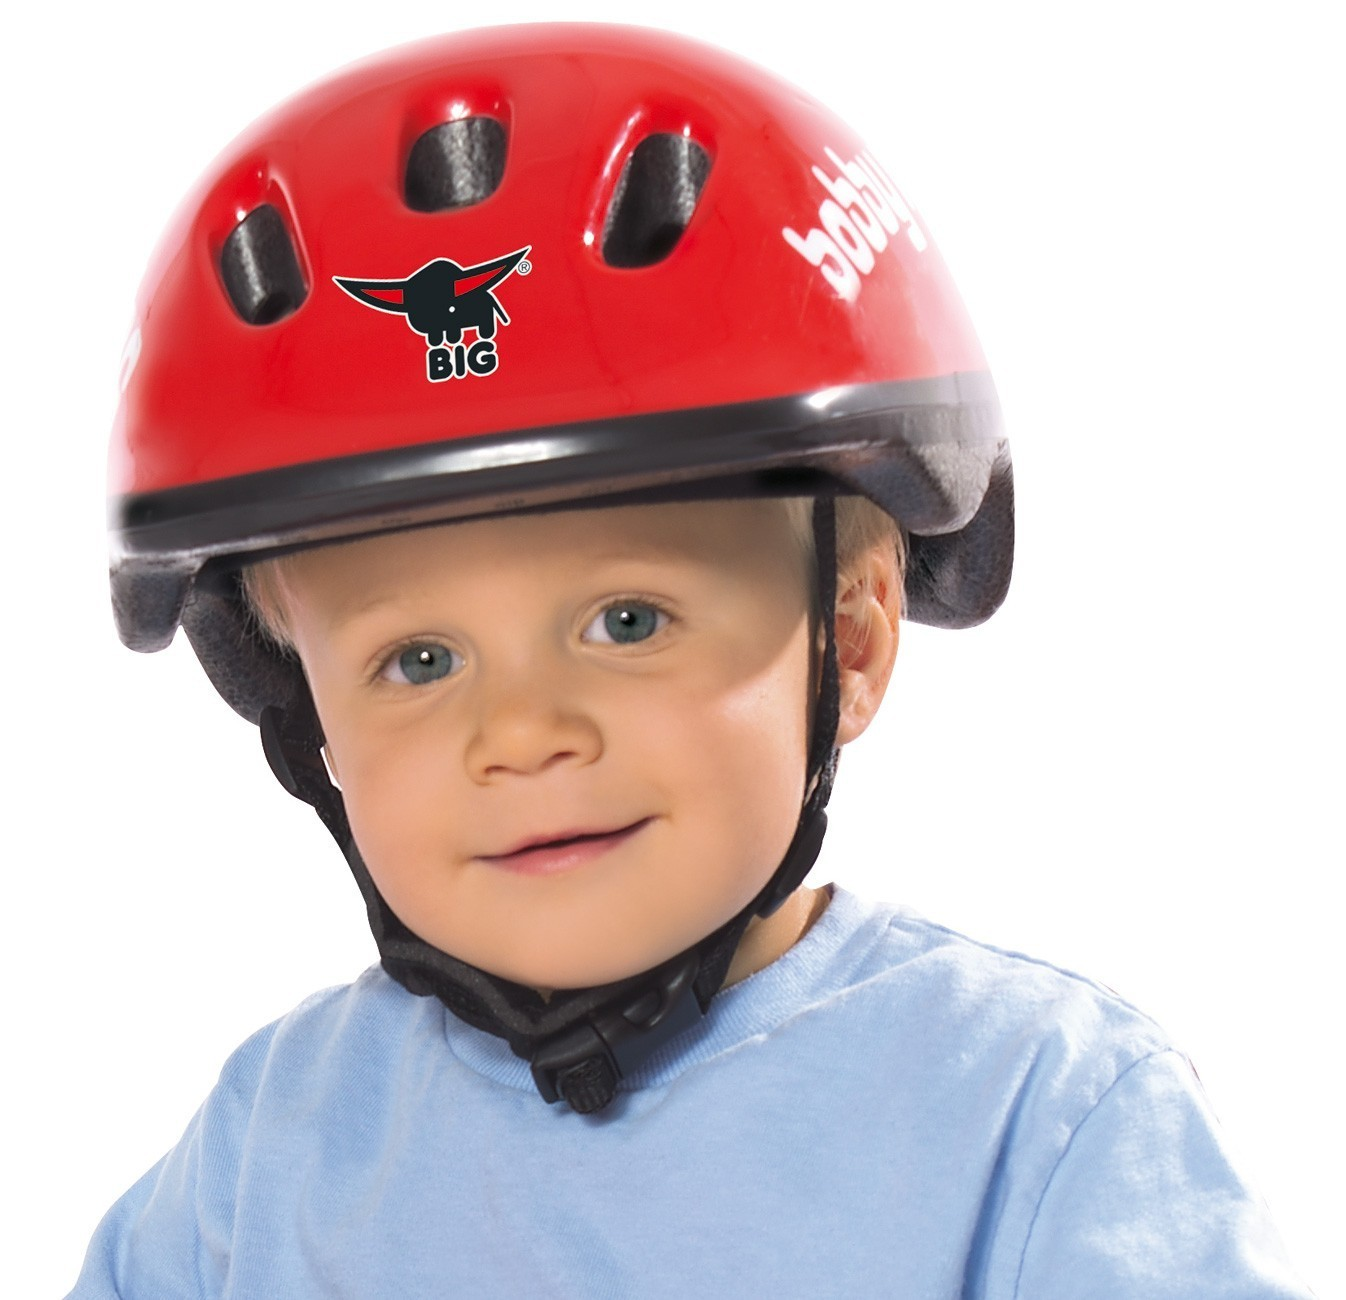 BIG Bobby Racing Helmet / Fahrradhelm Bild 2